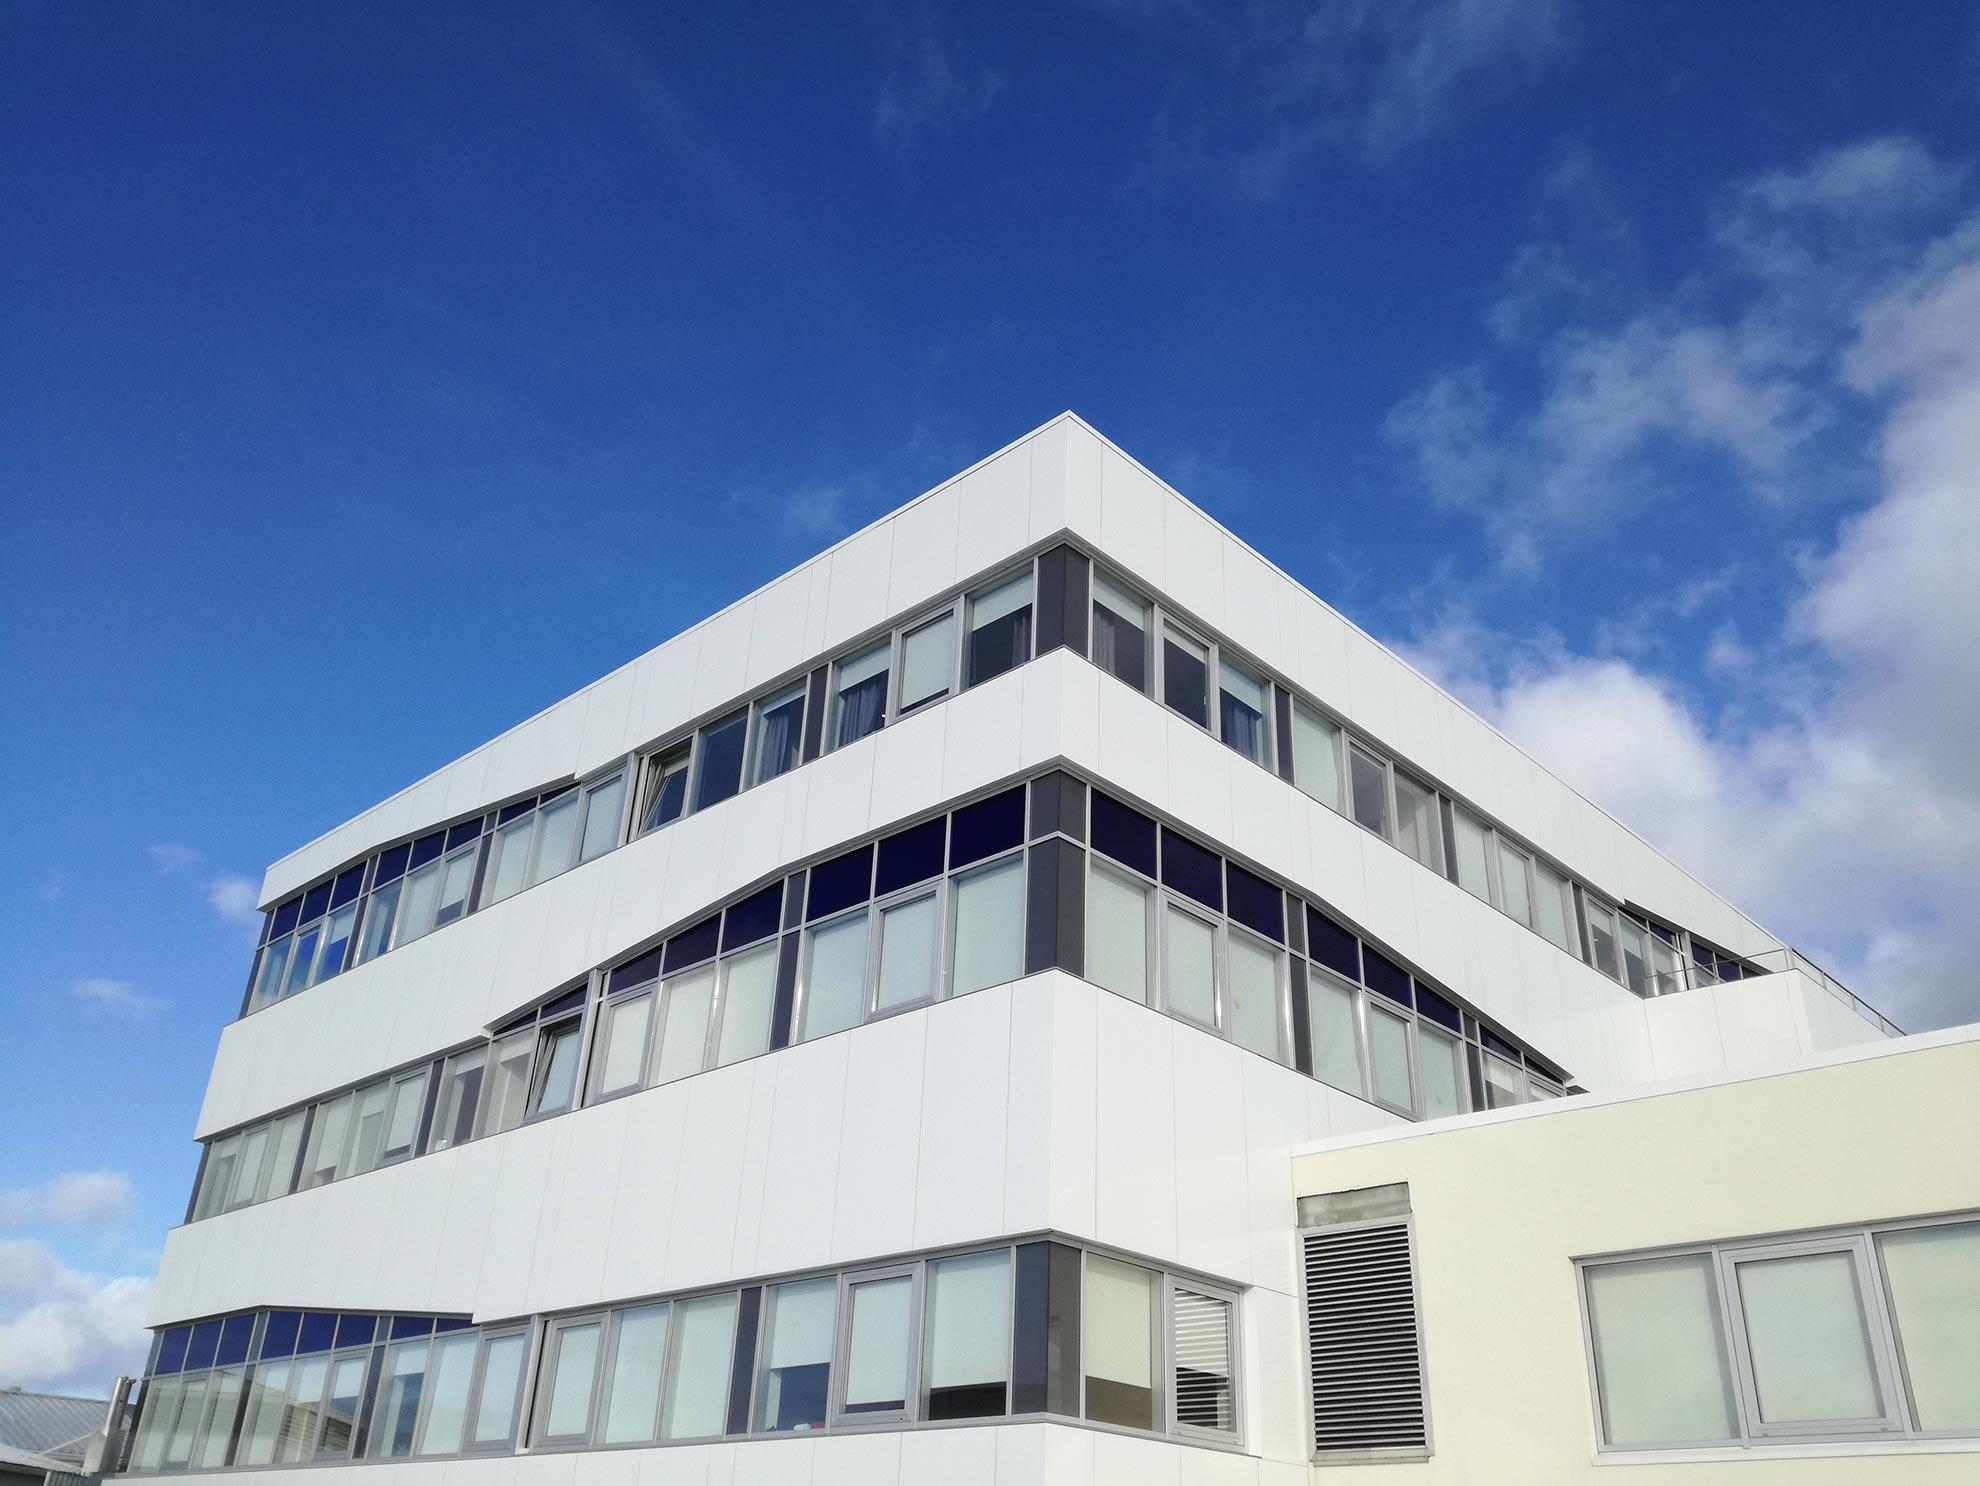 Aeropuerto-de-Reykjavik.-Islandia.-larson-fr-Blanco-pur-01-2_1591719918.jpg